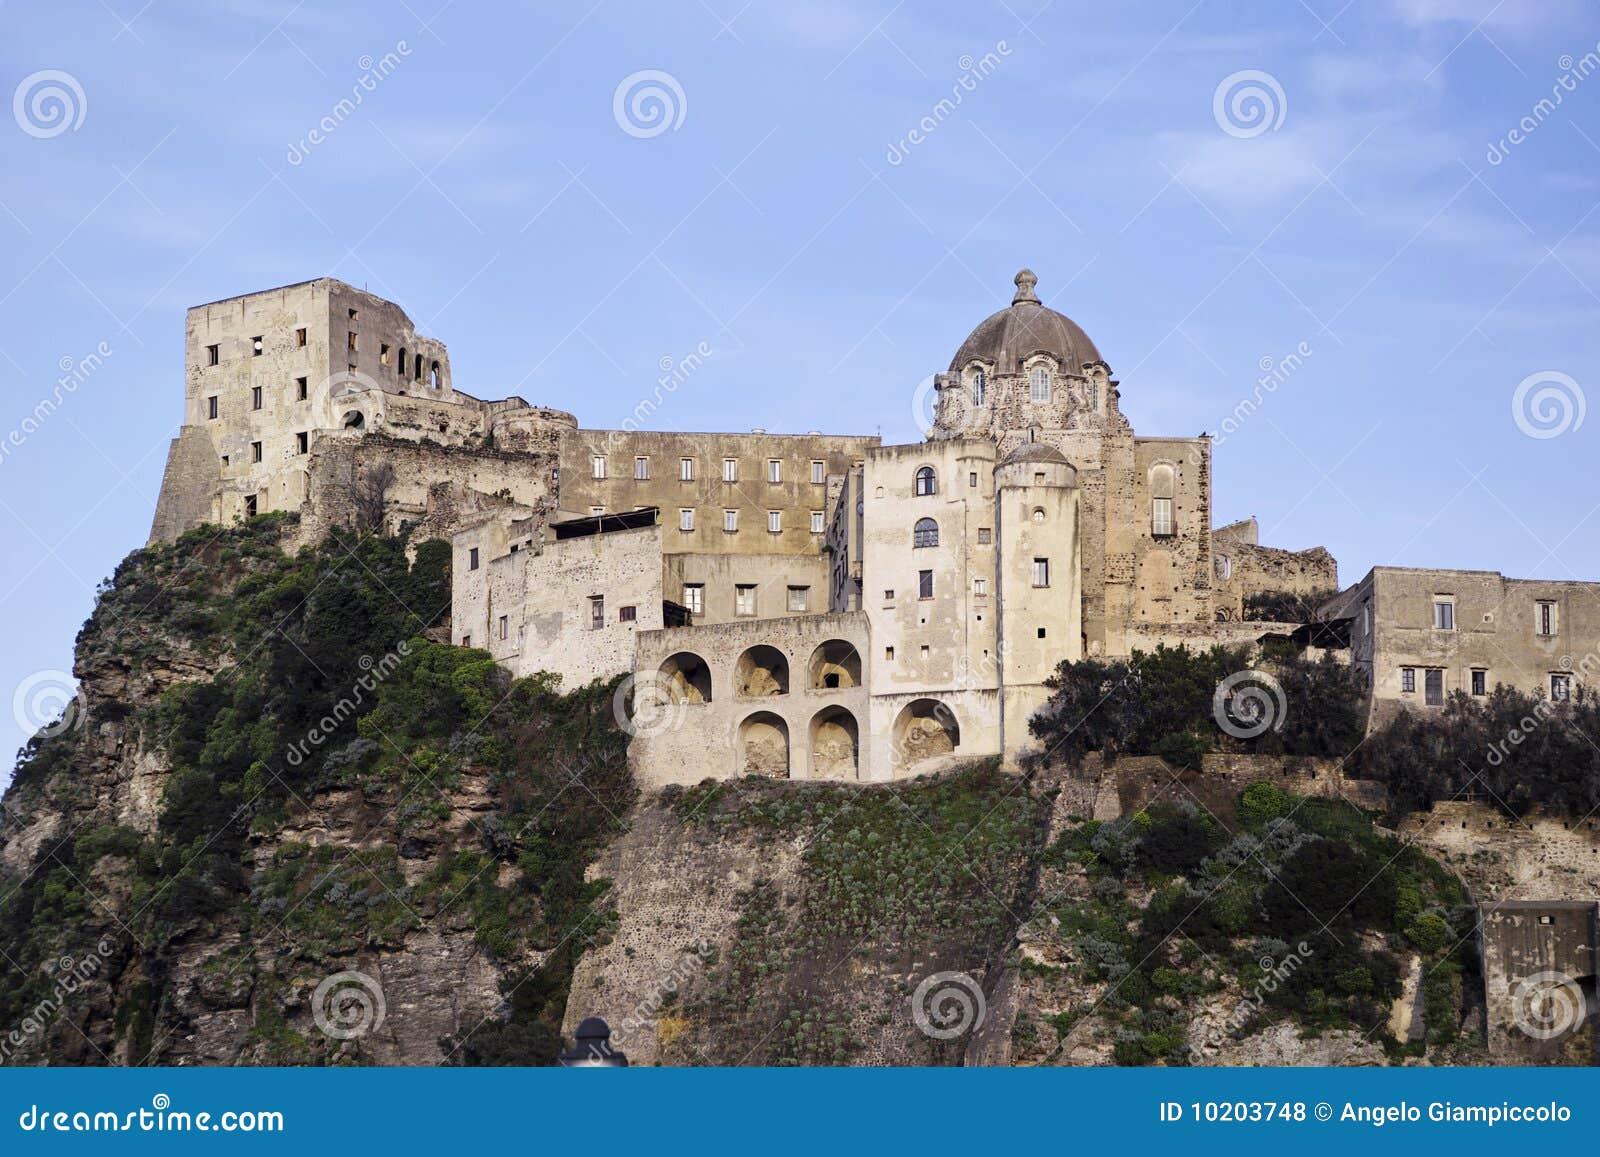 Ischia Island Italy  city photos gallery : ITALY, Campania, Ischia island, Ischia Ponte, Castel S.Angelo aragon ...